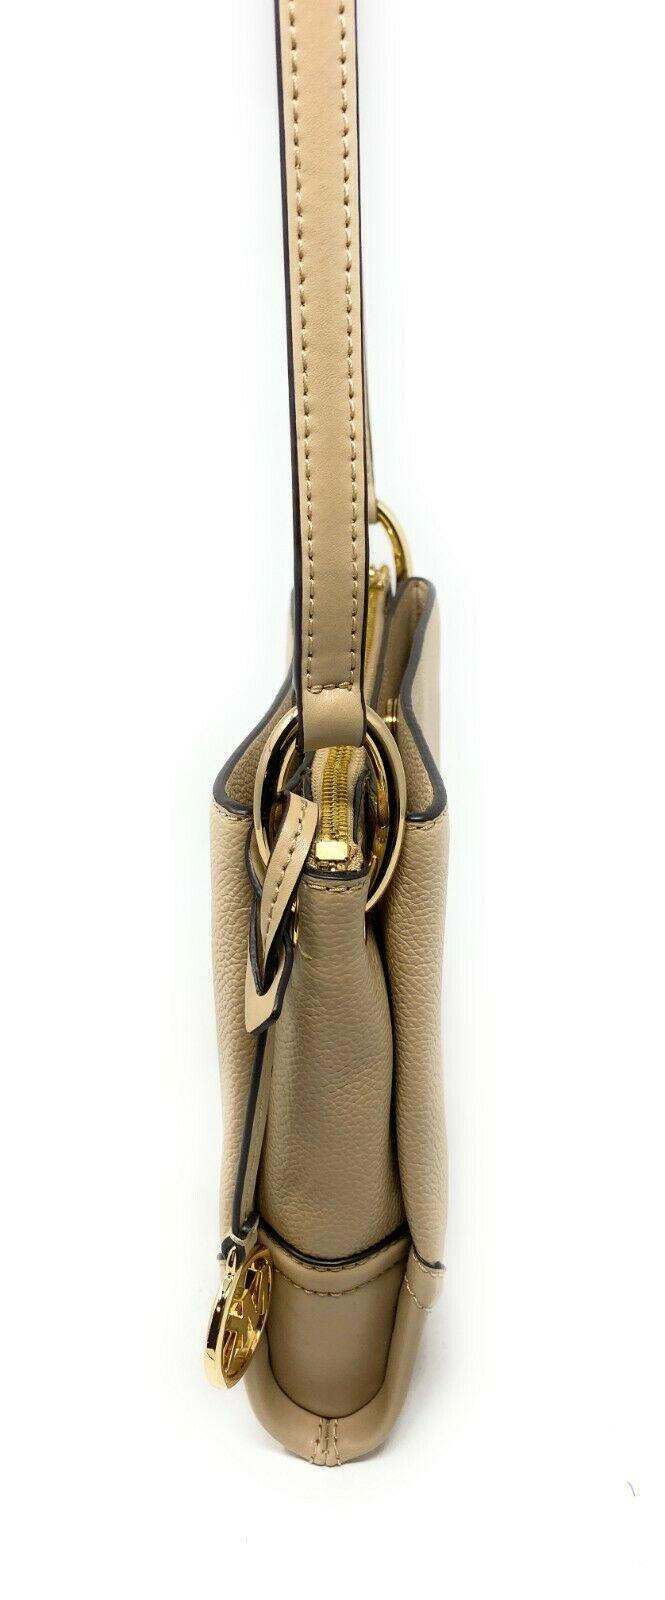 thumbnail 4 - Michael Kors Nicole Large Triple Compartment Crossbody Bag MK Purse